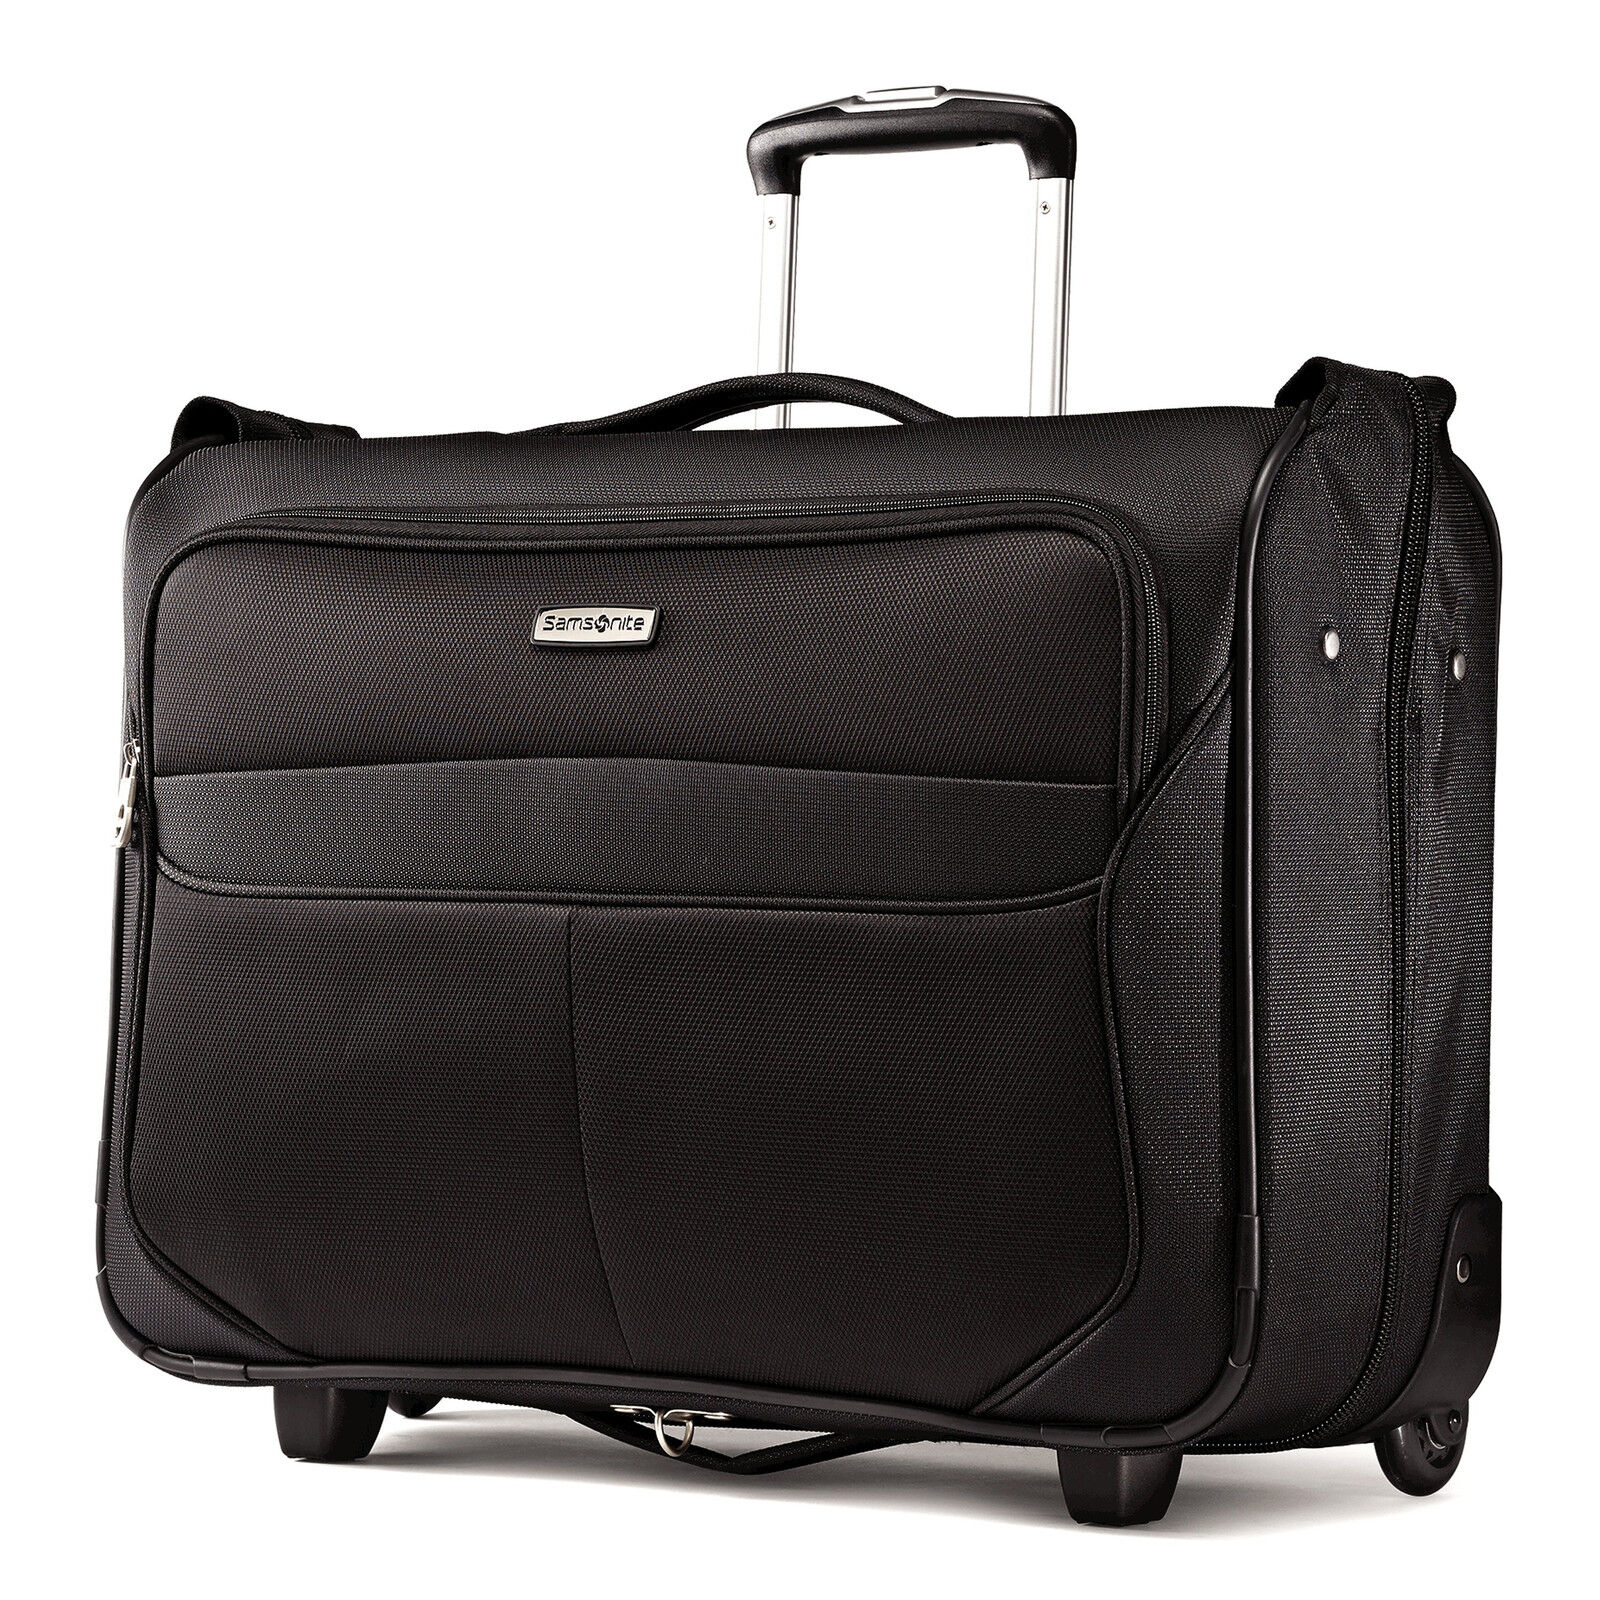 Samsonite Lift2 Carry On Wheeled Garment Bag Luggage Ebay